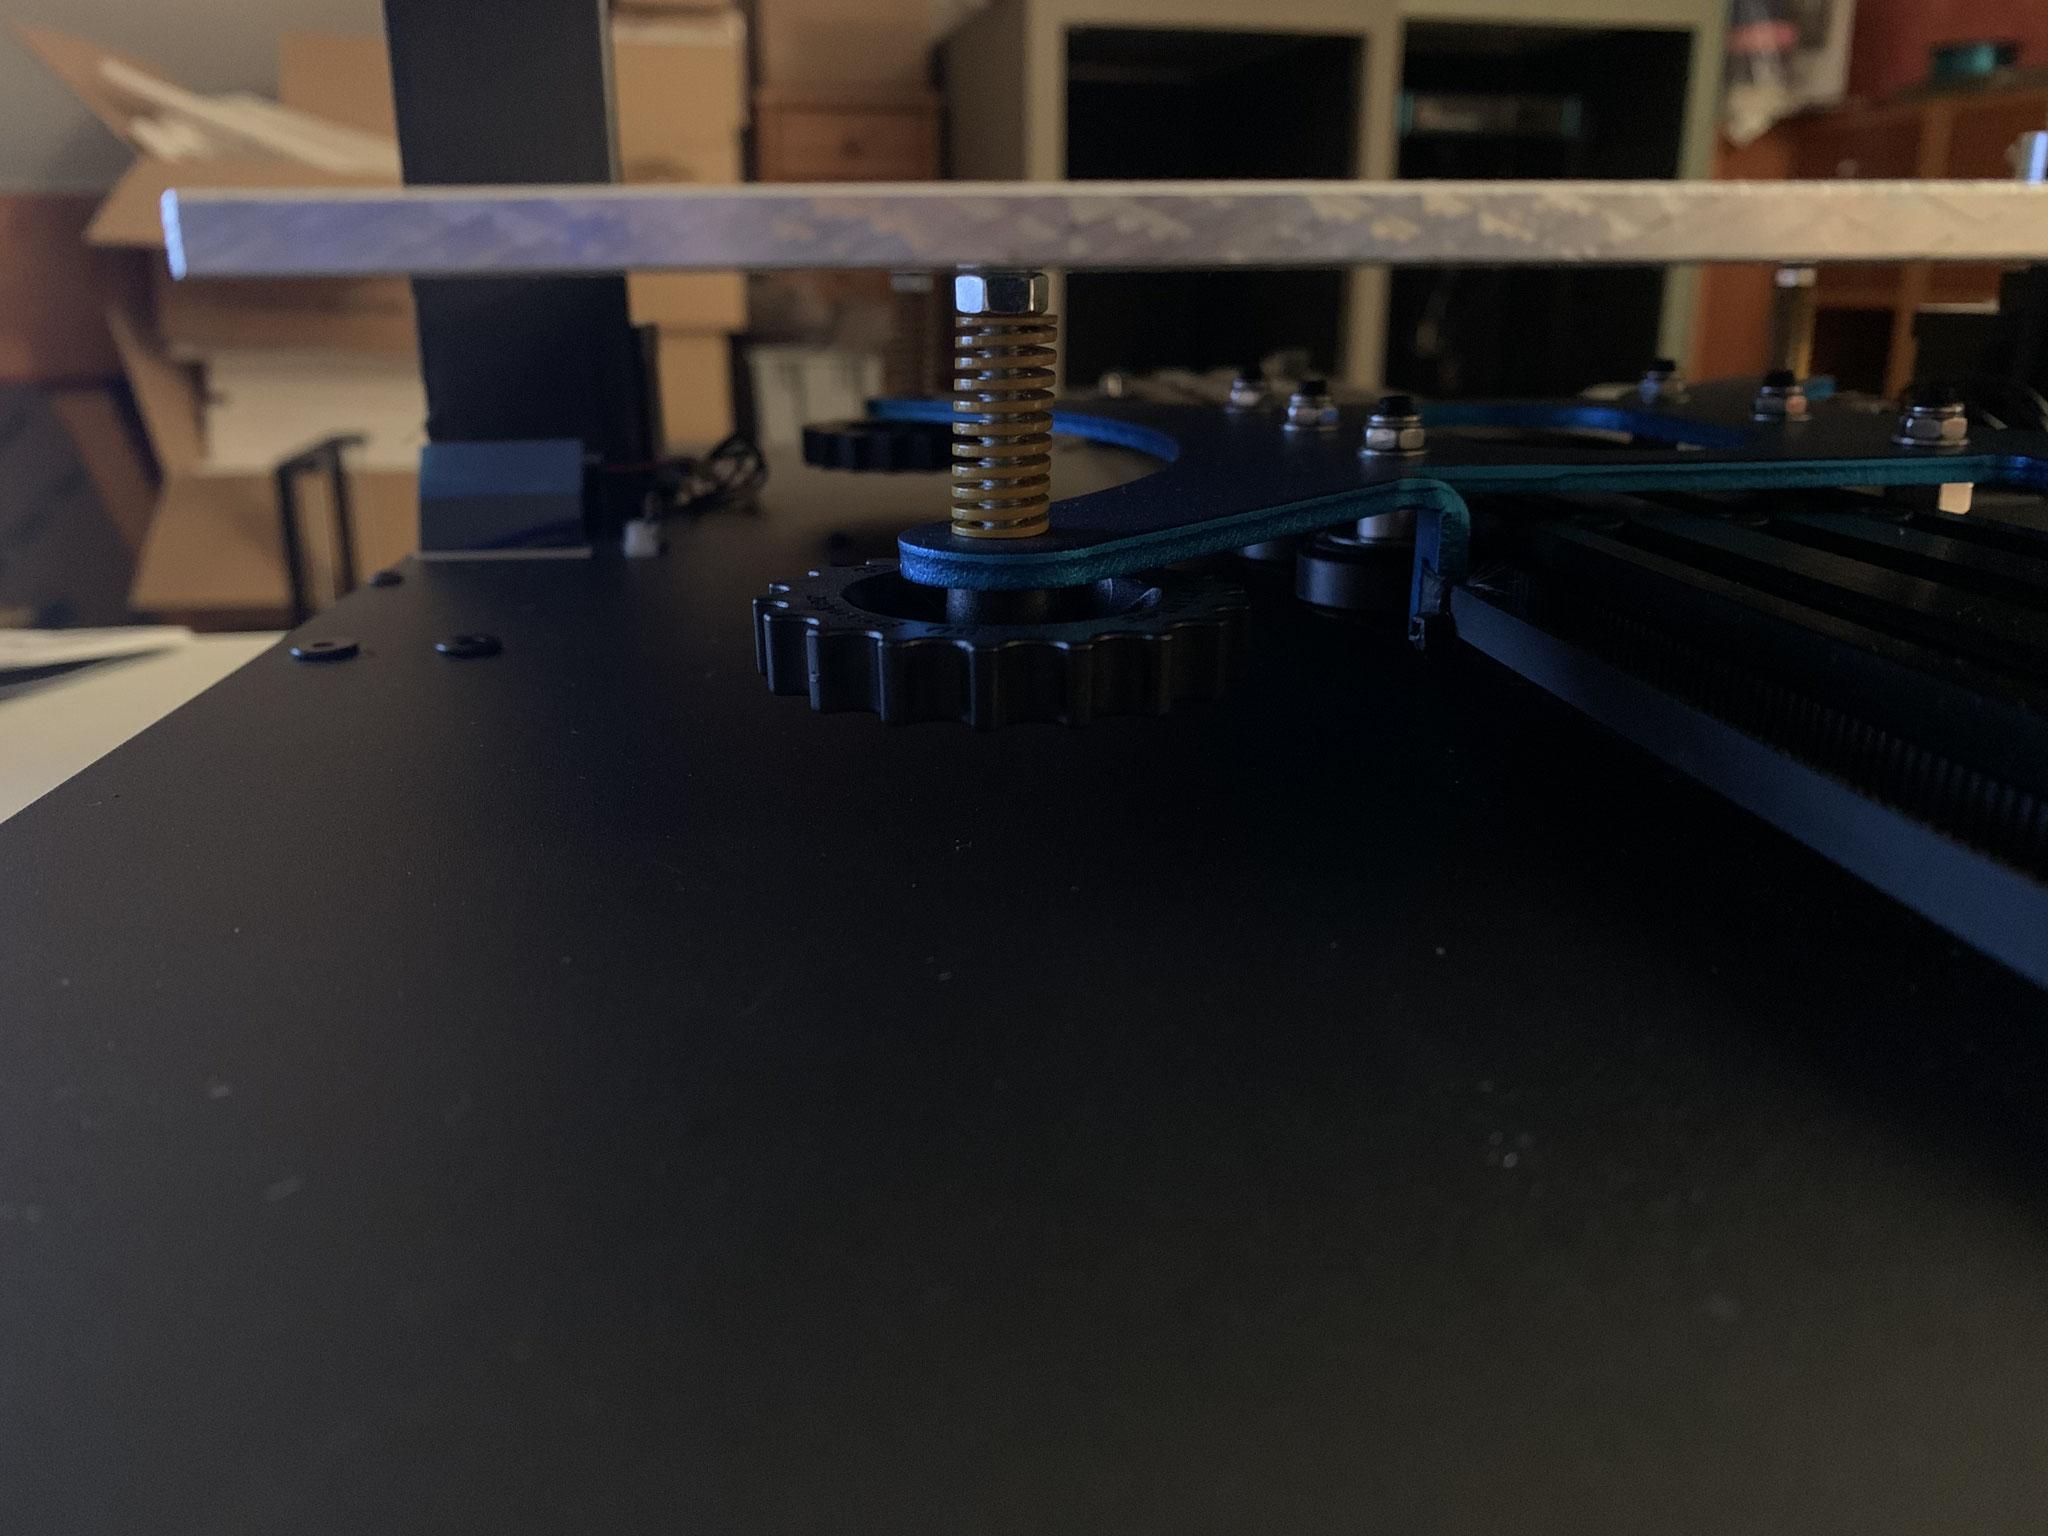 Sidewinder X1 mit plangefräster Aluminium-Guss-Platte 5 mm